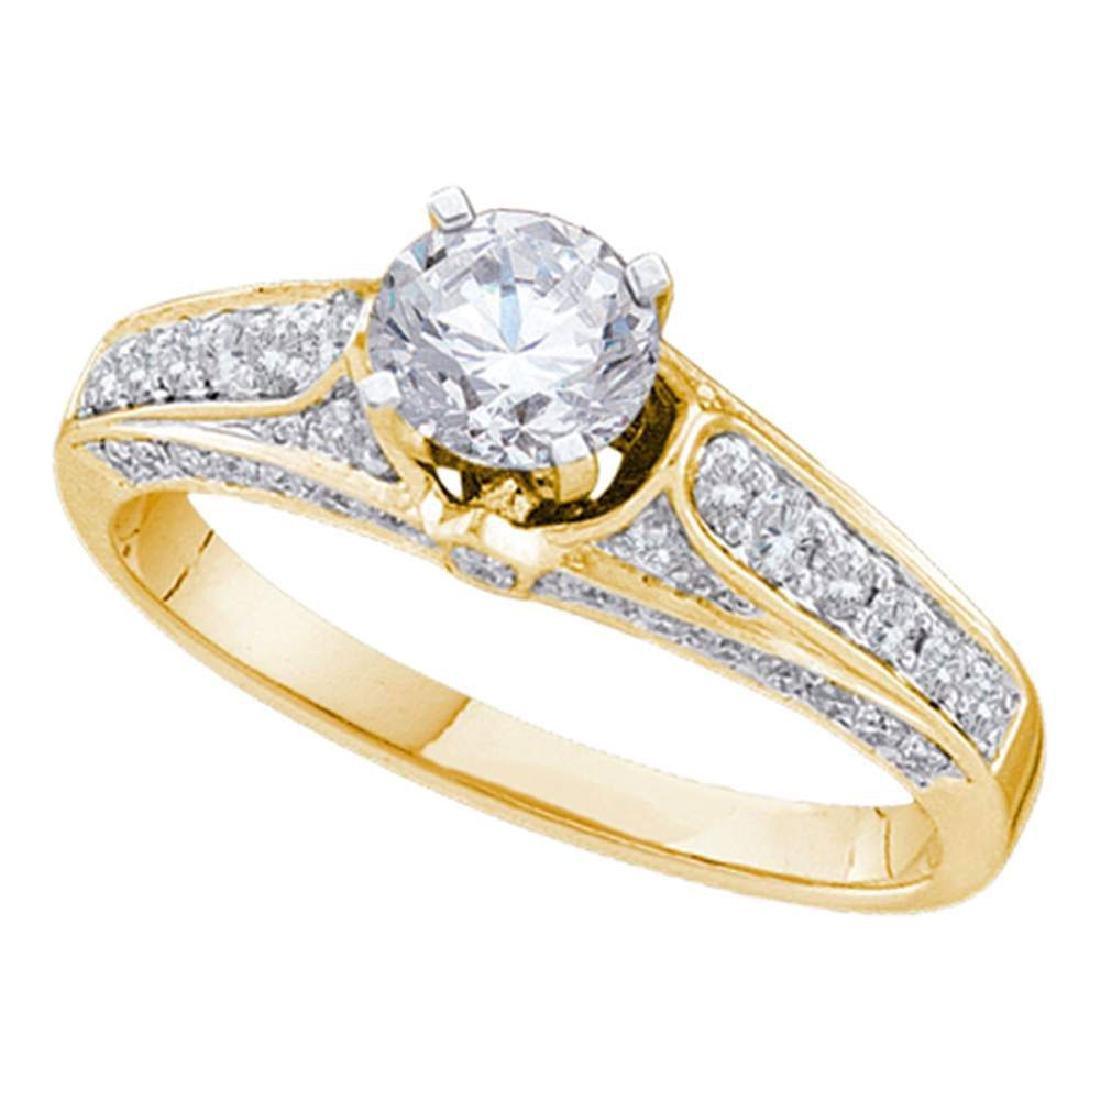 14k Yellow Gold Round Diamond Solitaire Bridal Wedding